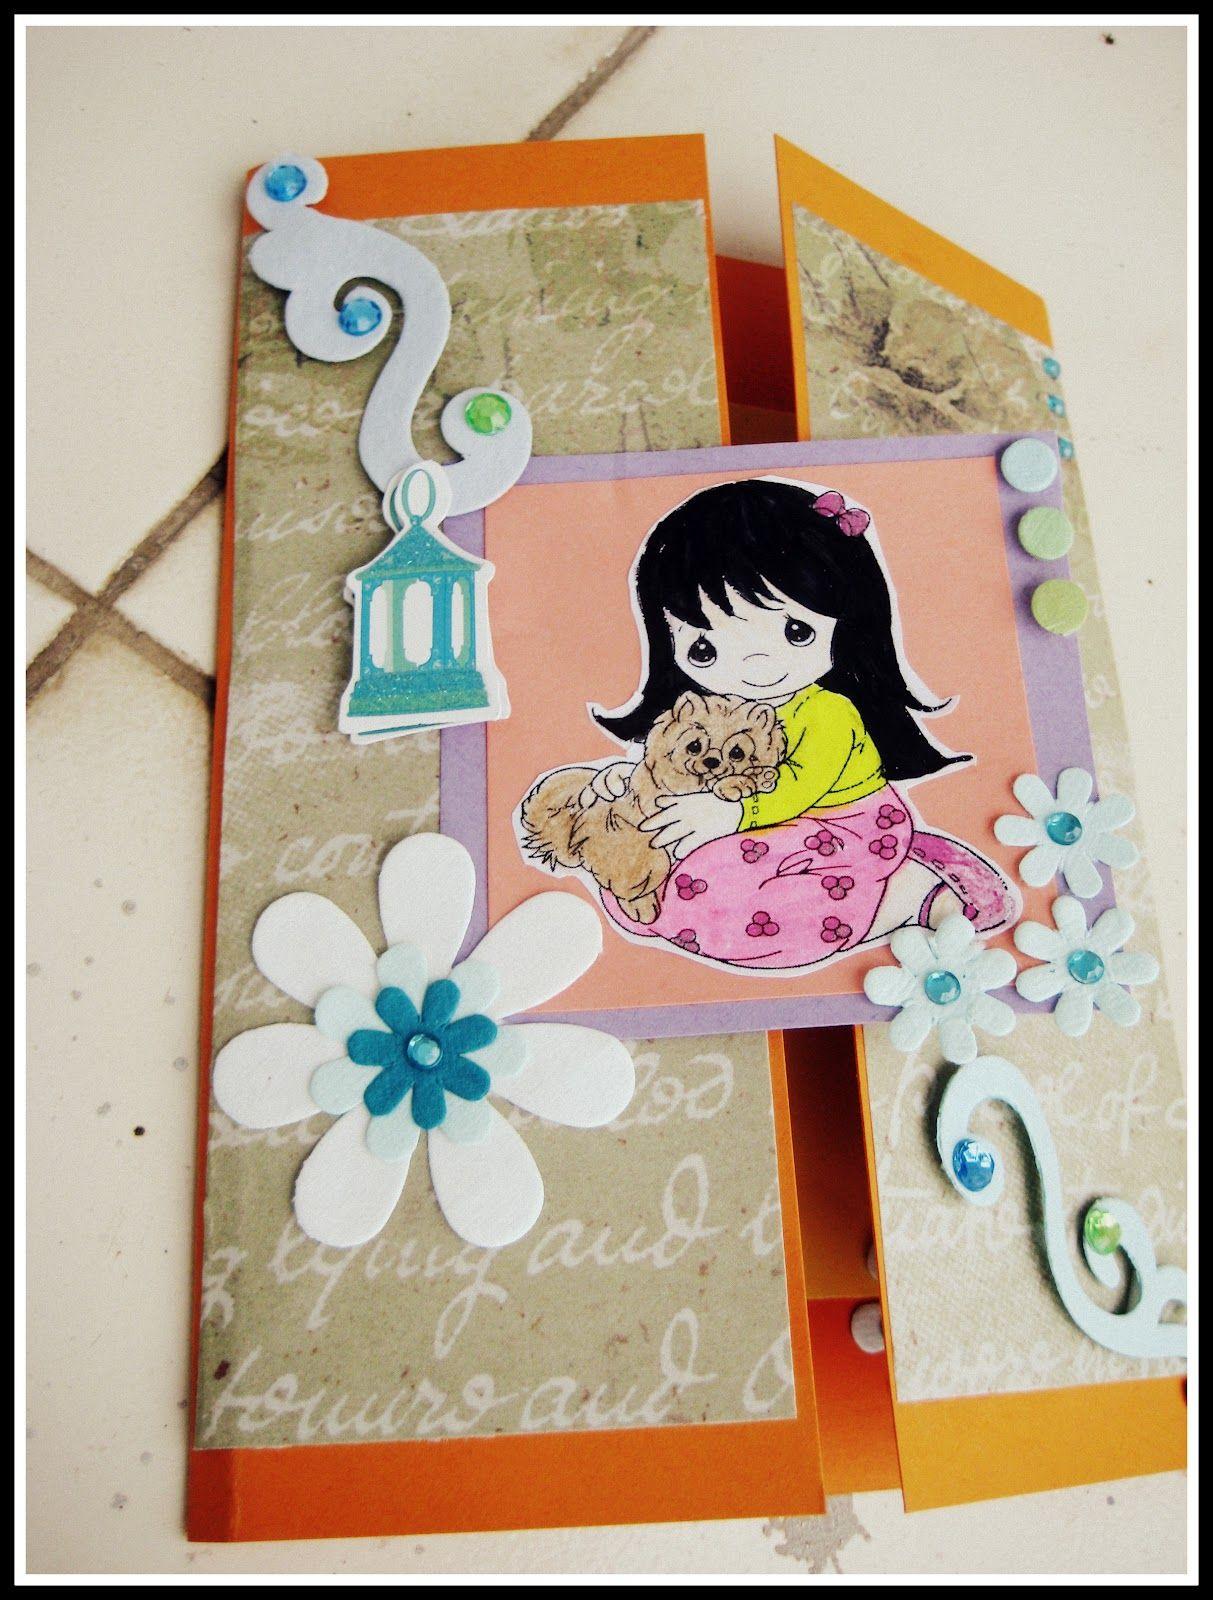 Friendship Day Cards For Best Friend Handmade Friendship Day